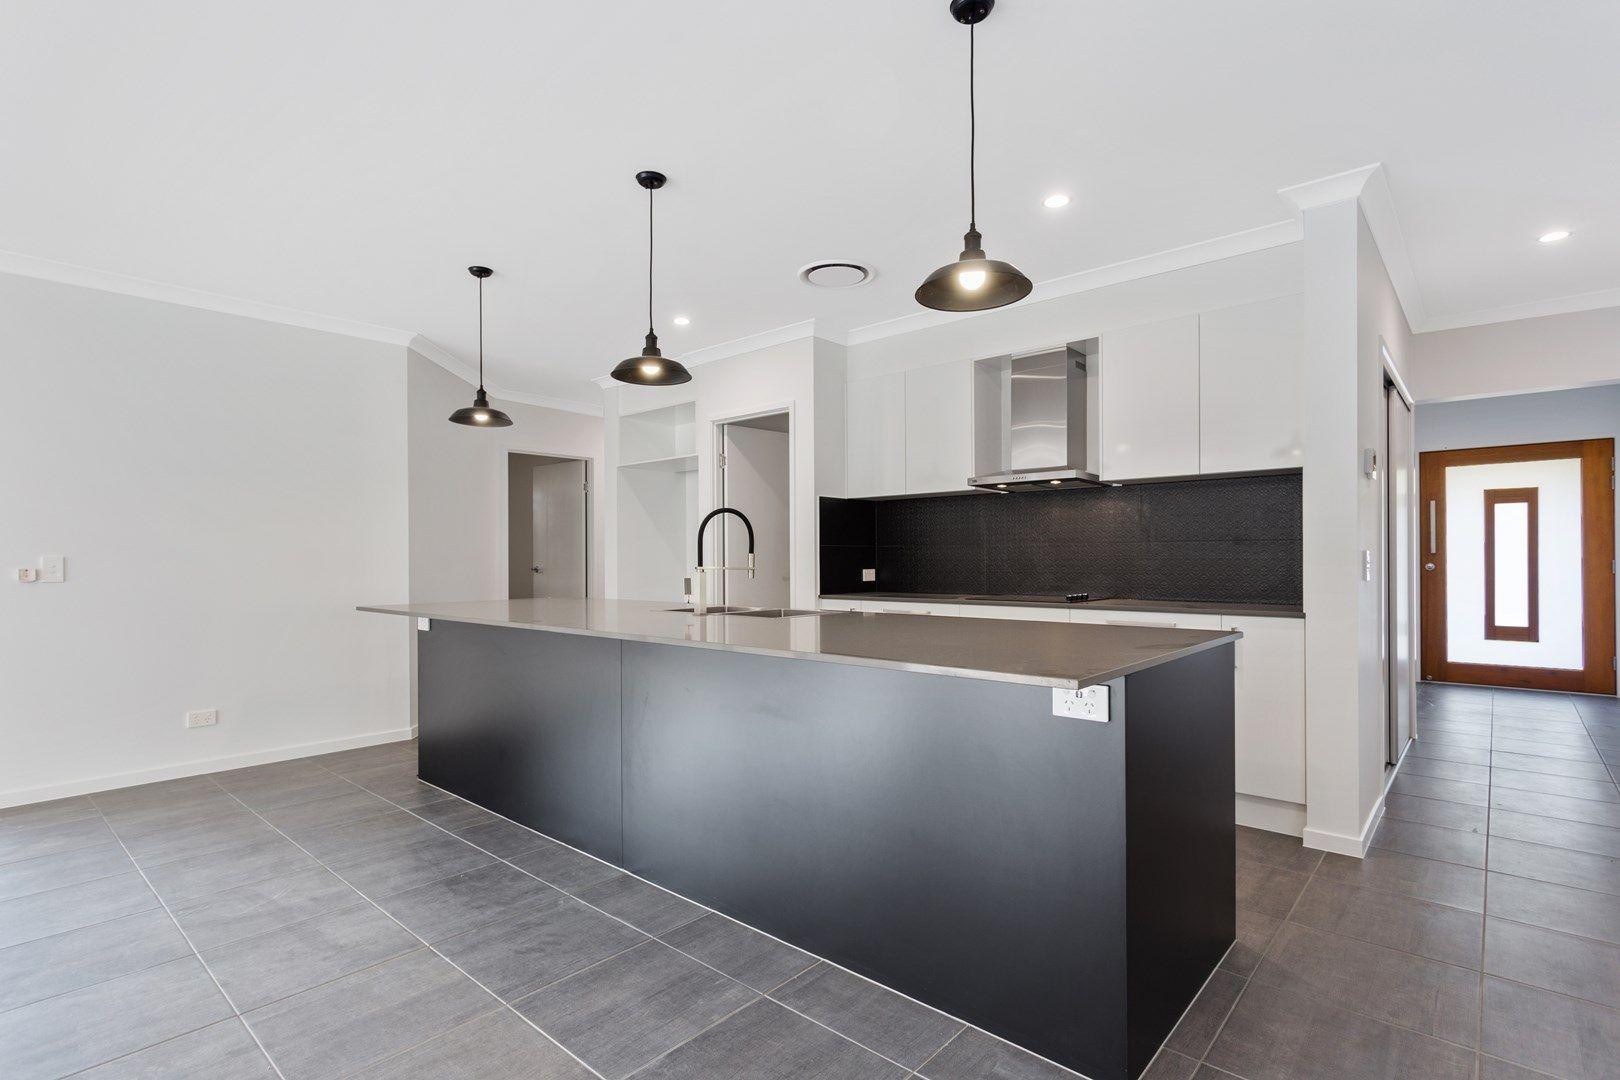 Lot 7 Cedarwood Place, Landsborough QLD 4550, Image 0